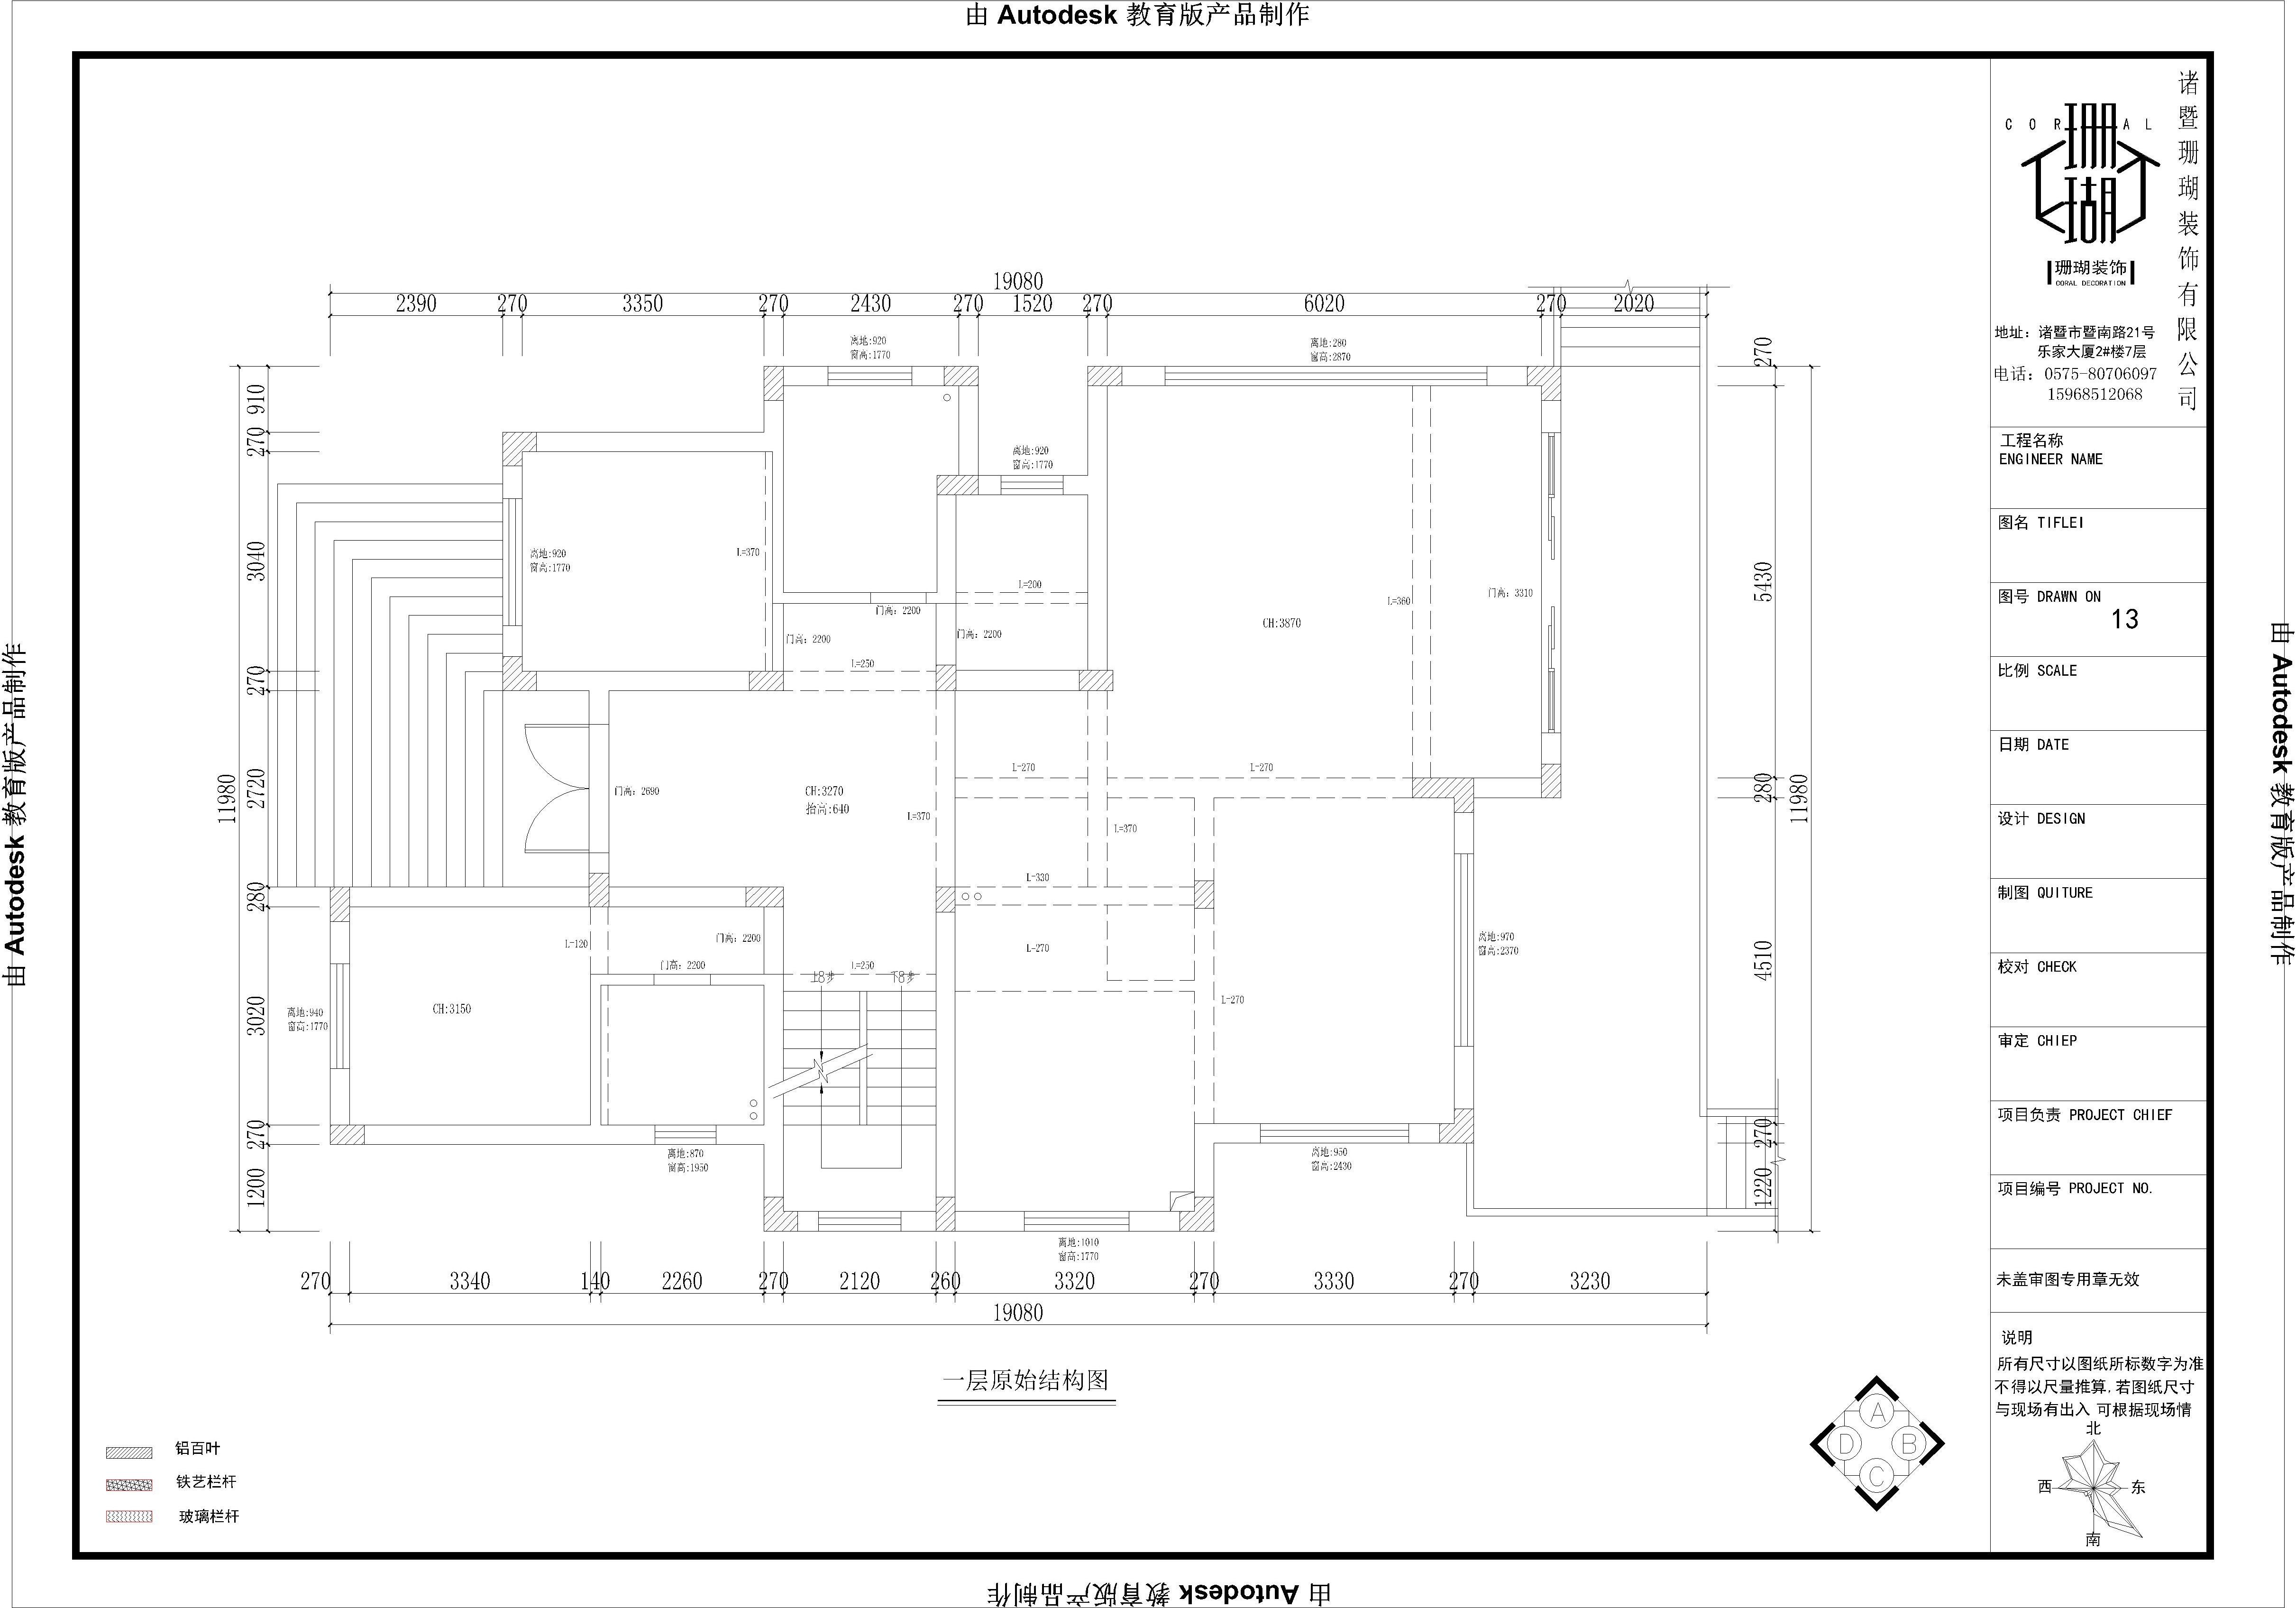 530m²独栋别墅大宅装修实景案例分享 |现代风格简洁、干净、明亮